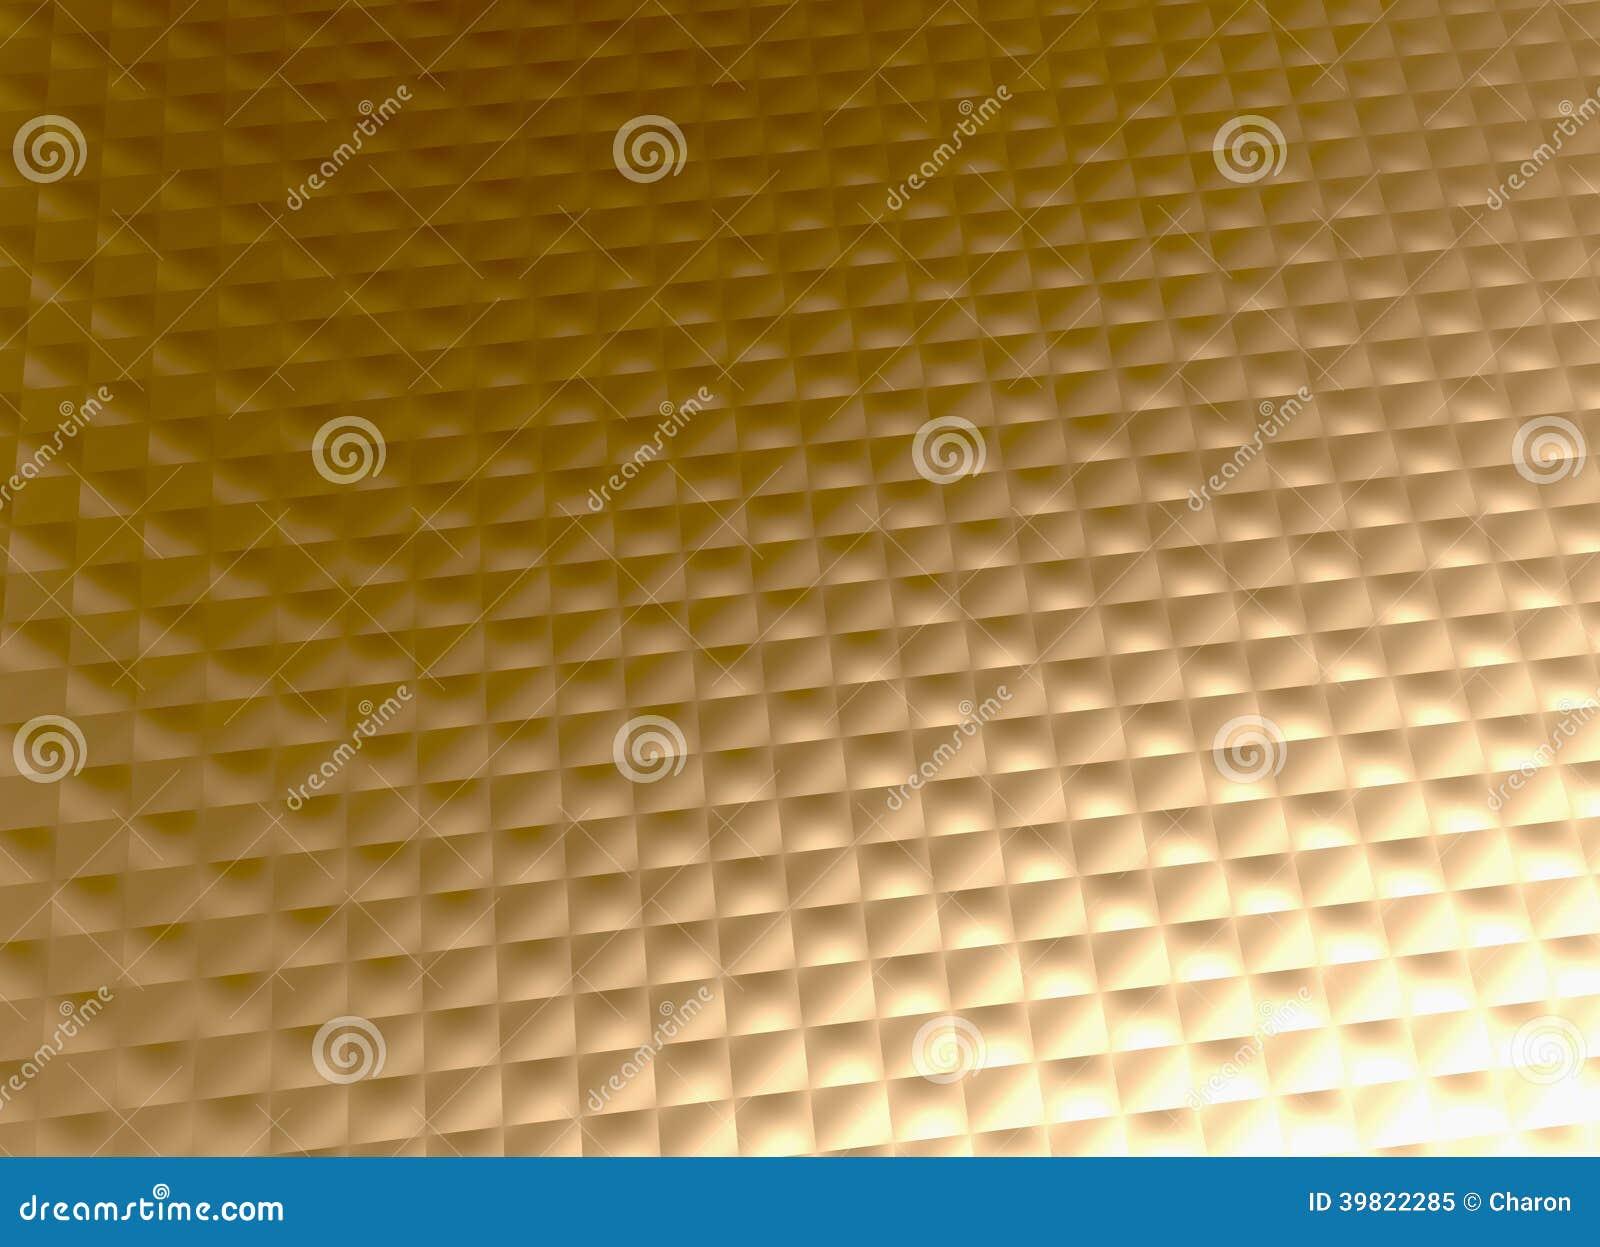 Gold Metal Background Golden Grid Pattern Stock Photo